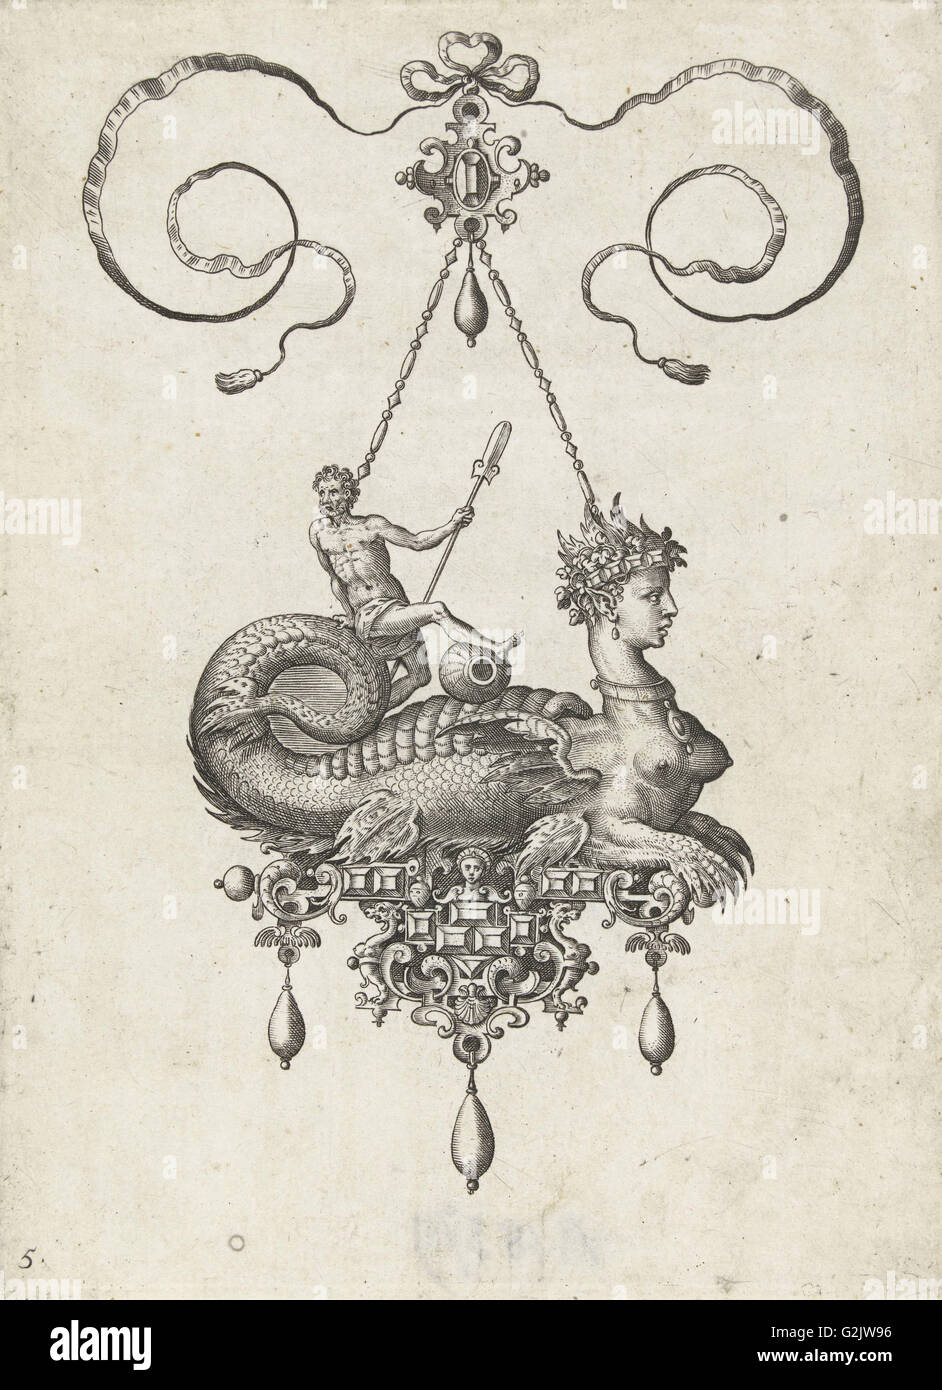 Pendant with sphinx, Adriaen Collaert, Hans Collaert (I), Philips Galle, 1582 - Stock Image